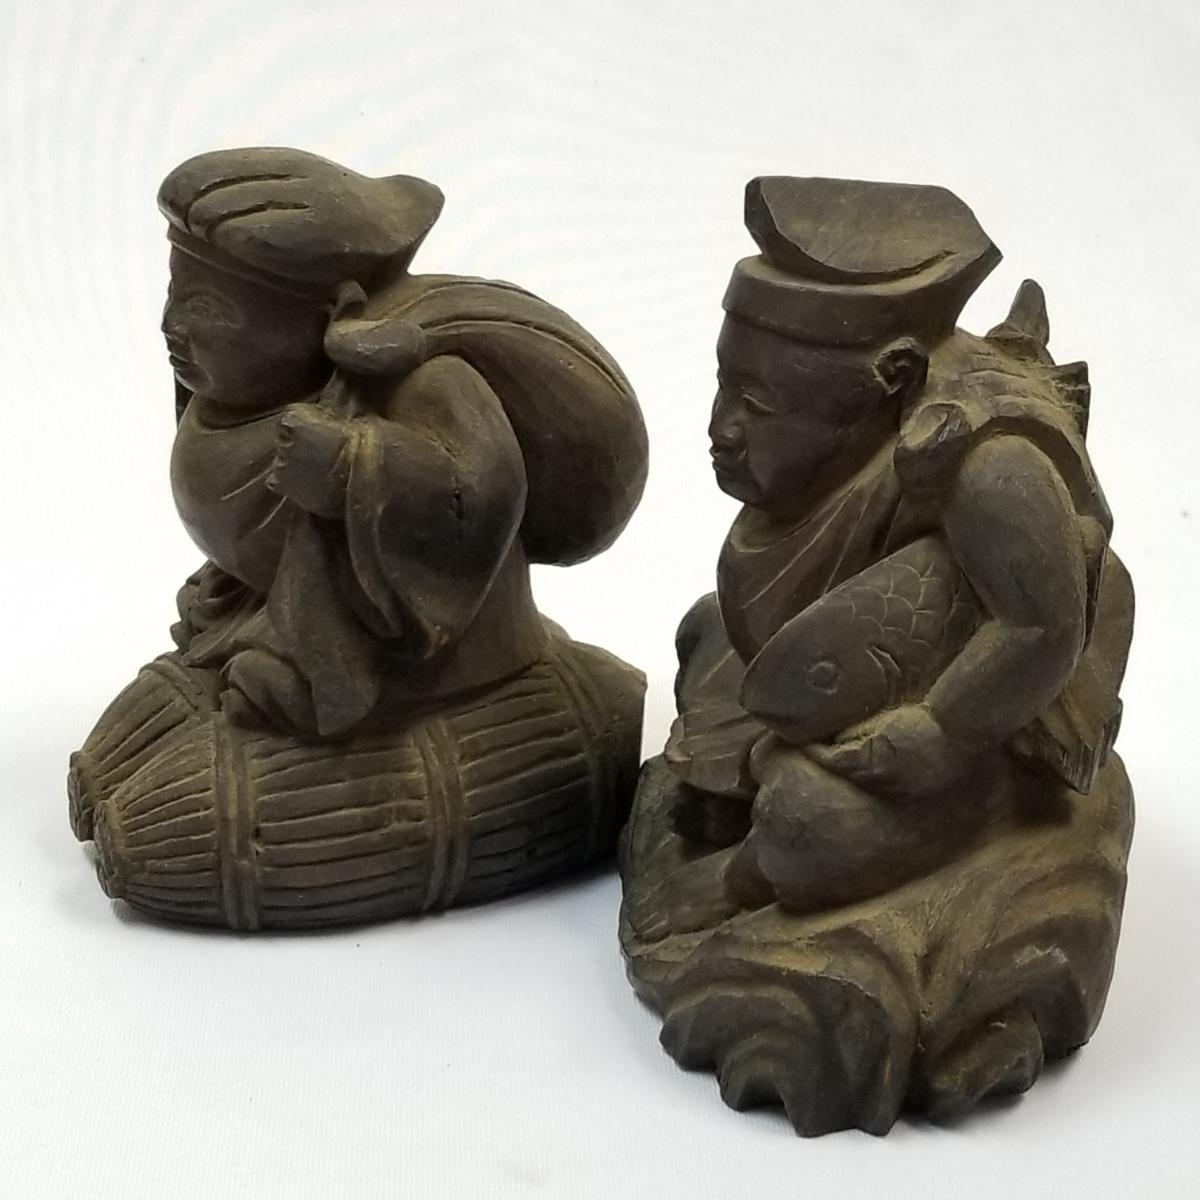 ◇時代物 木製 木彫り 彫刻 置物 恵比寿大黒 検索/ 仏具 仏像 寺院 宗教 東洋 中国美術 アンティーク (t5-3/1_画像3